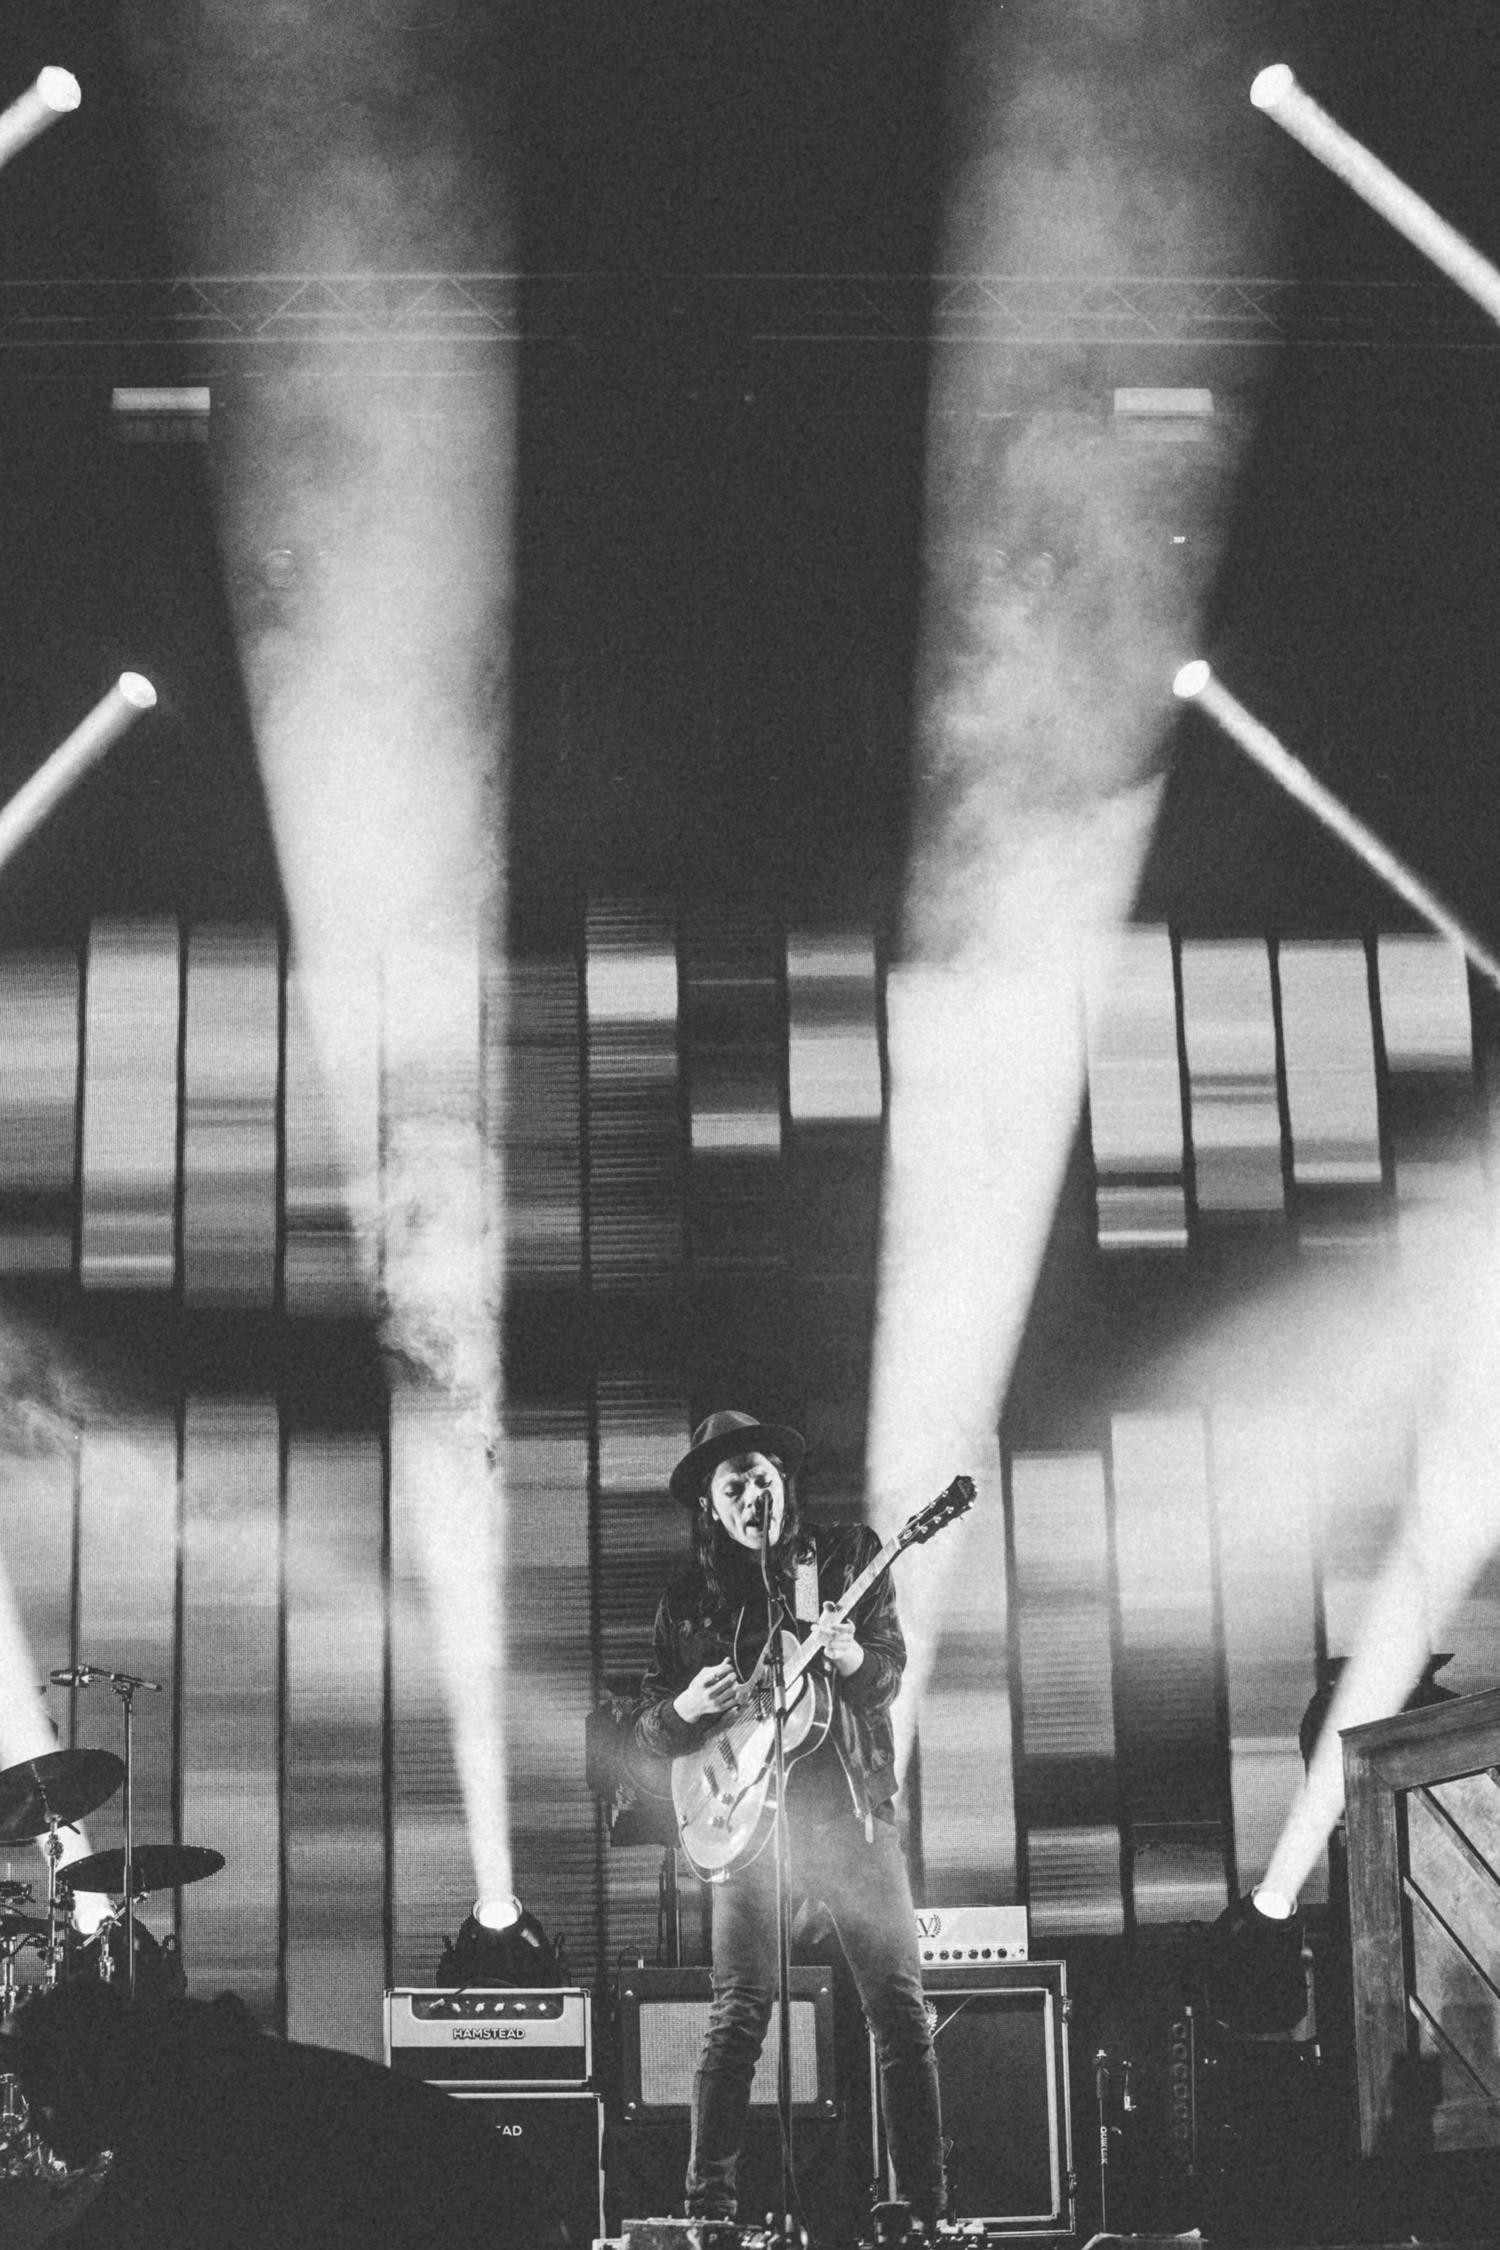 James-Bay-Live-Boardmasters-Music-Concert-Darina-Stoda-Photography-Photographer-17.jpg